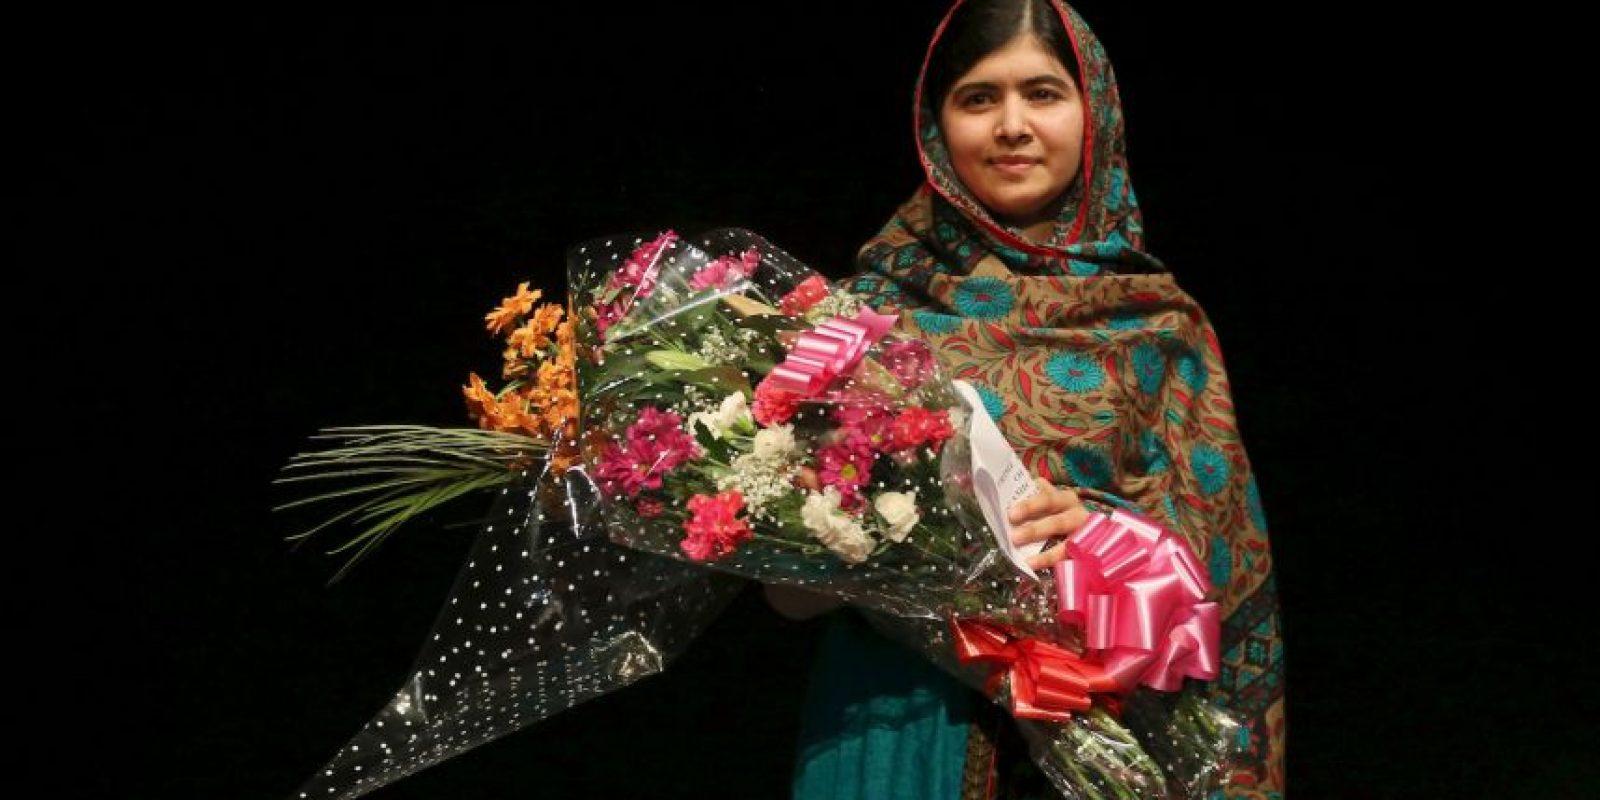 El portavoz del TTP, Ehsanullah Ehsan, afirmó que intentarán matarla de nuevo. Foto:Getty Images